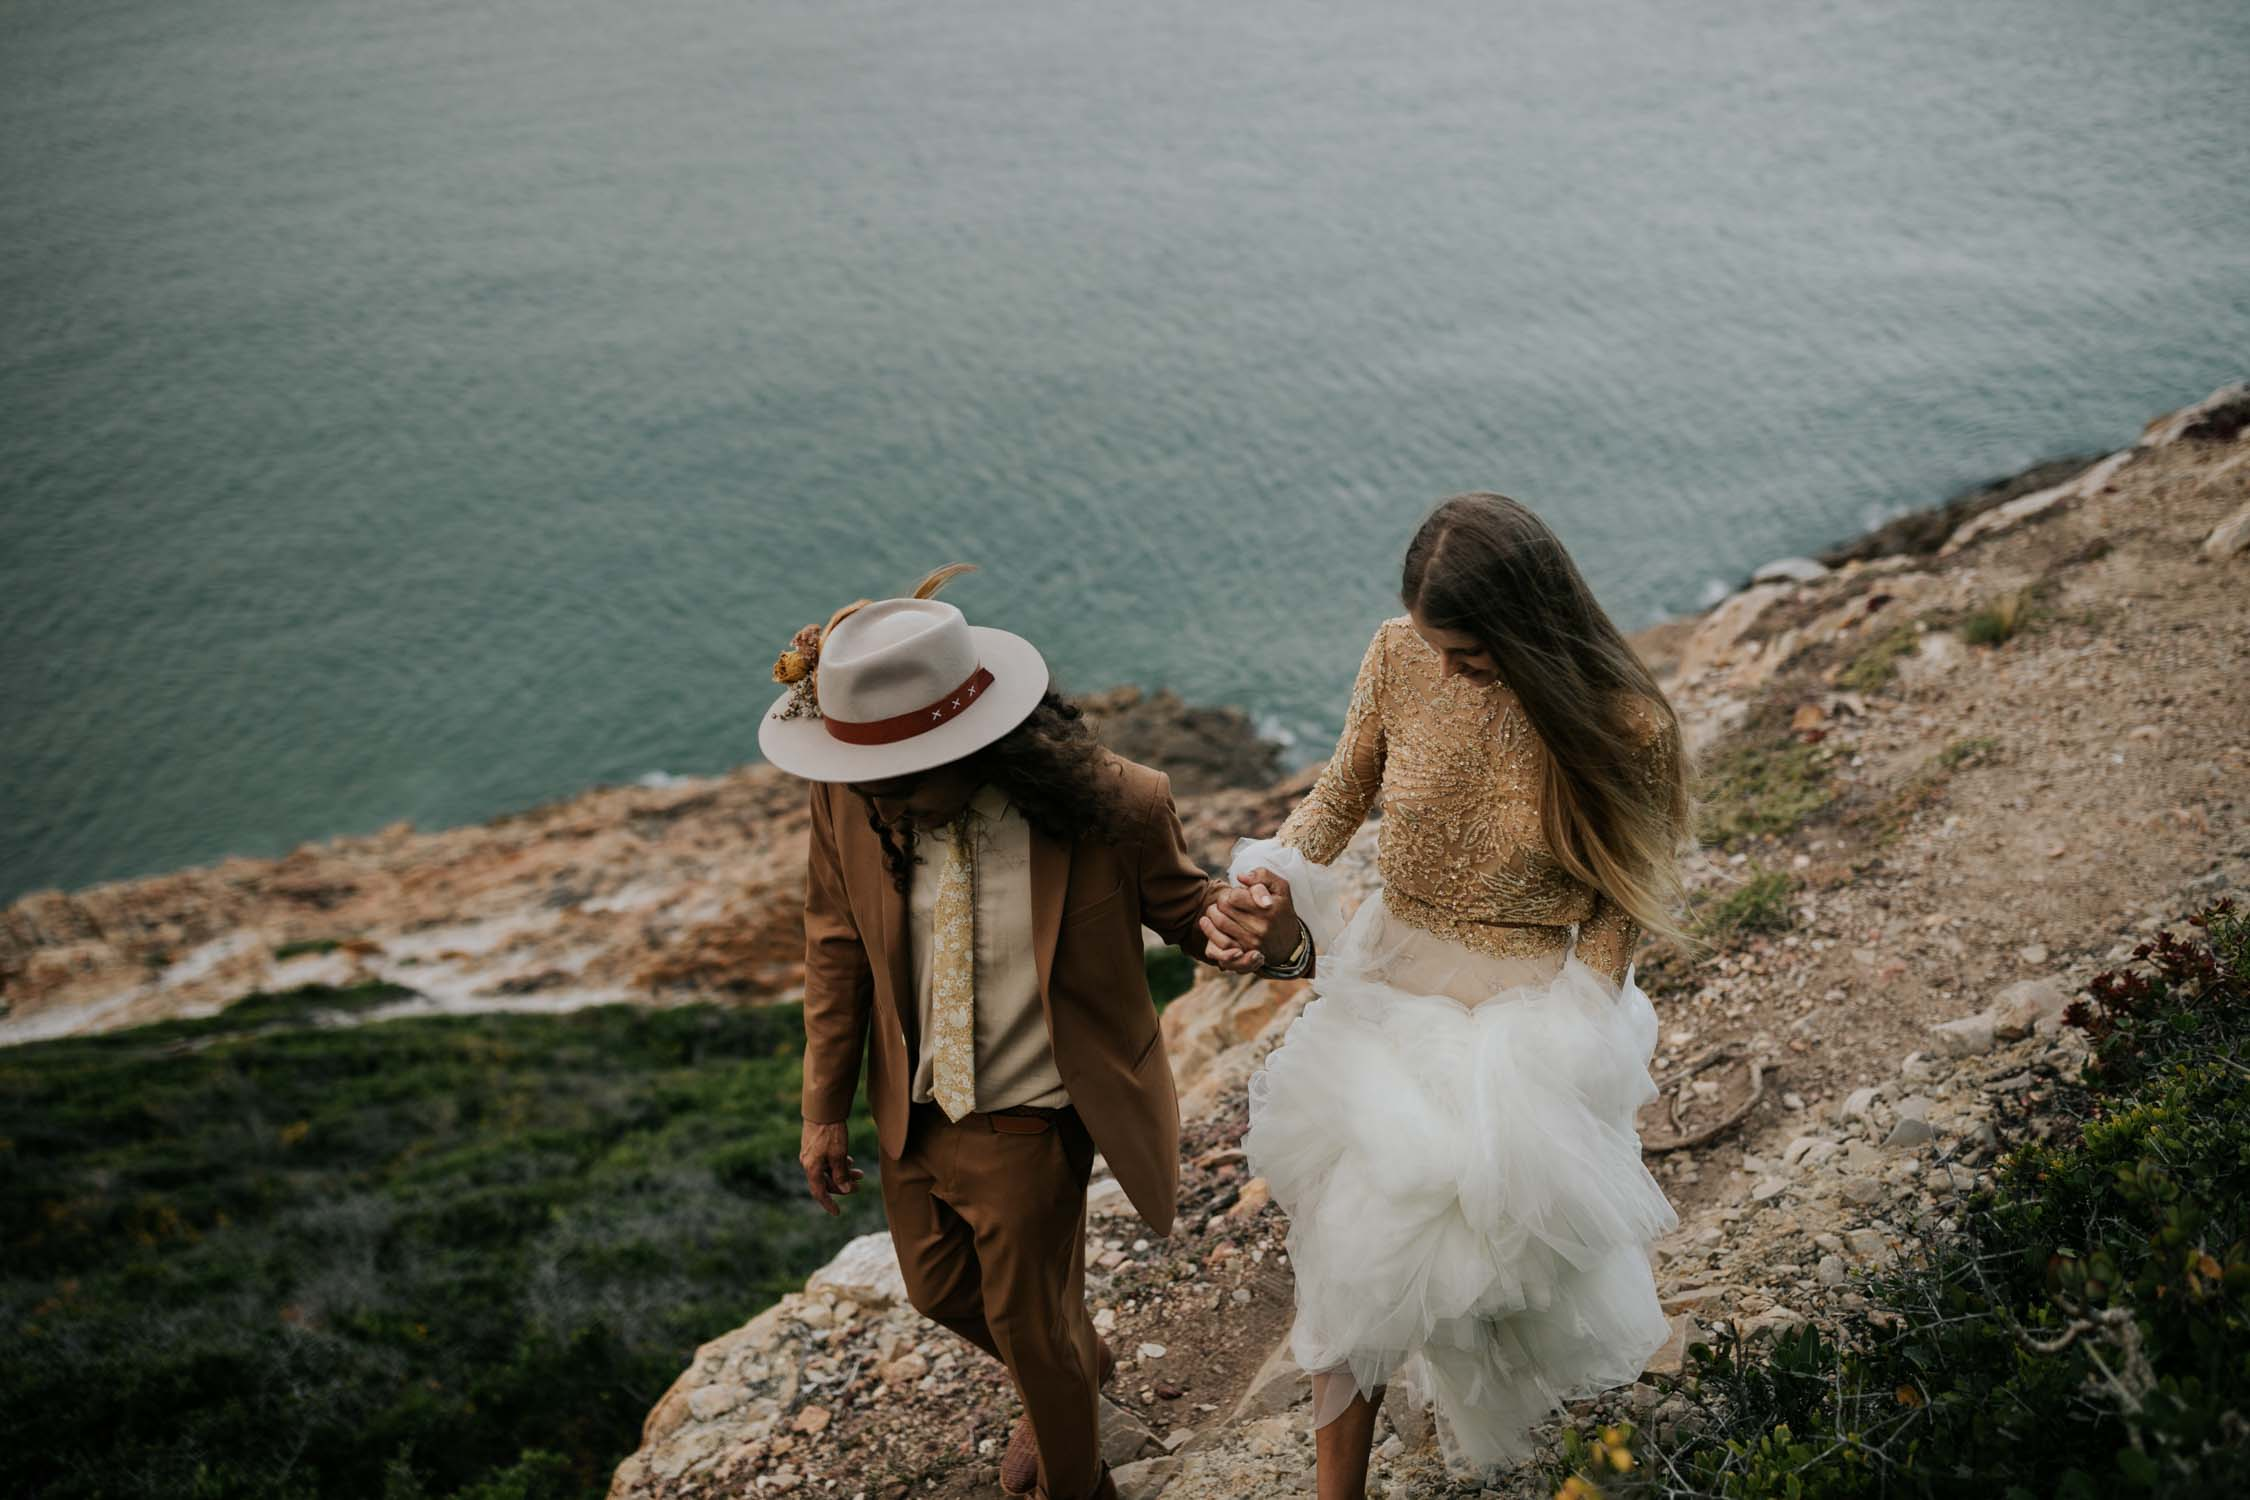 Adventurous wedding couple take their wedding photos in epic Robberg Nature Reserve, Plett, Garden Route, South Africa